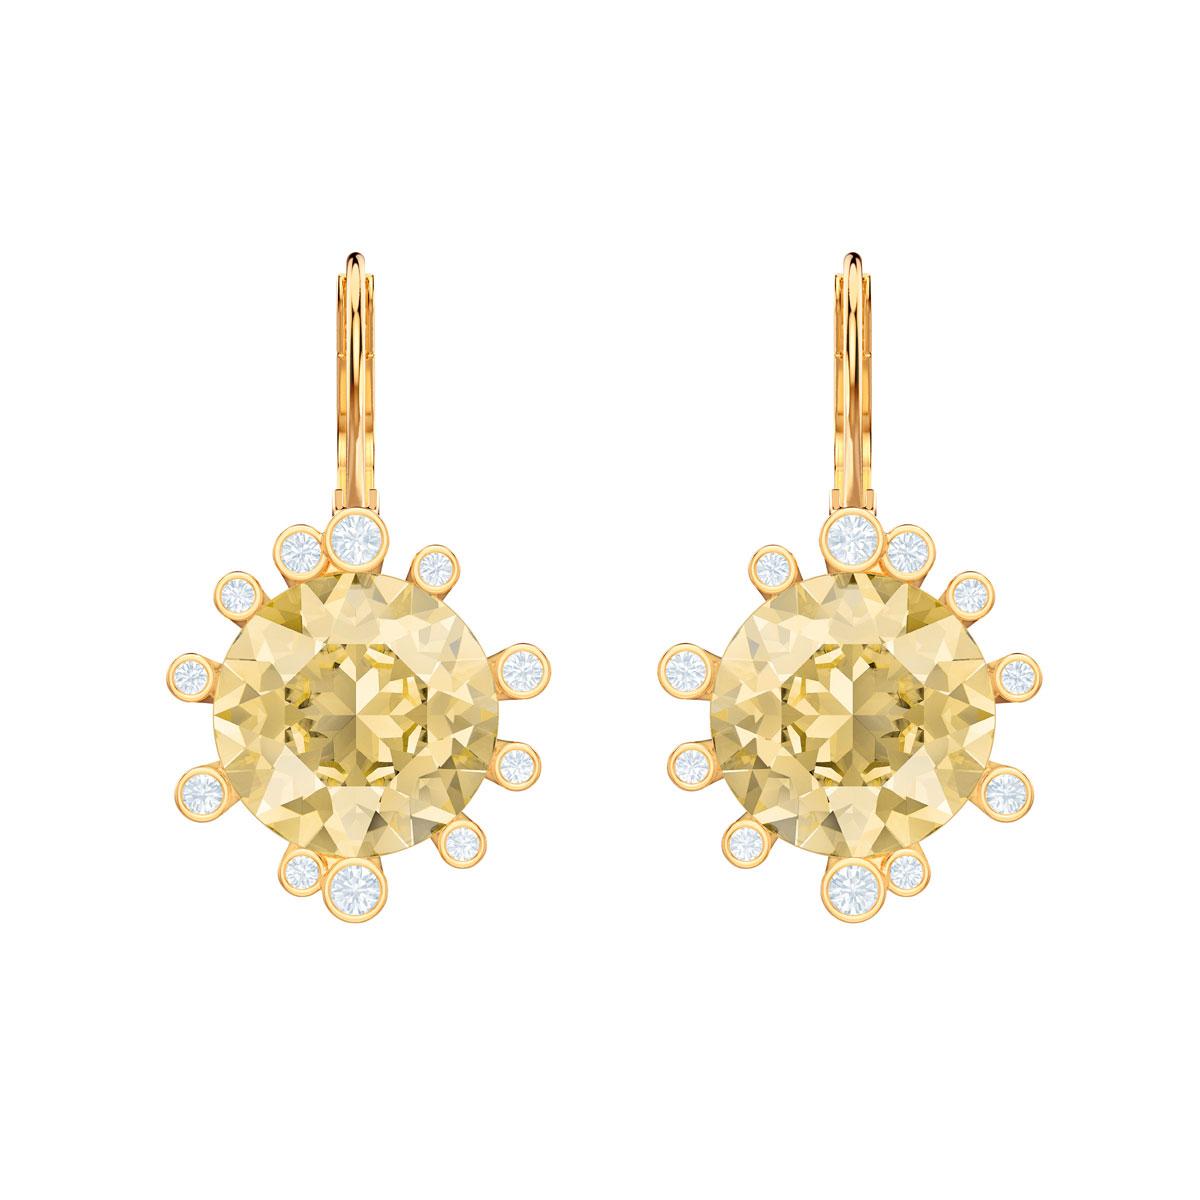 Swarovski Olive Pierced Earrings, Multi Colored, Gold